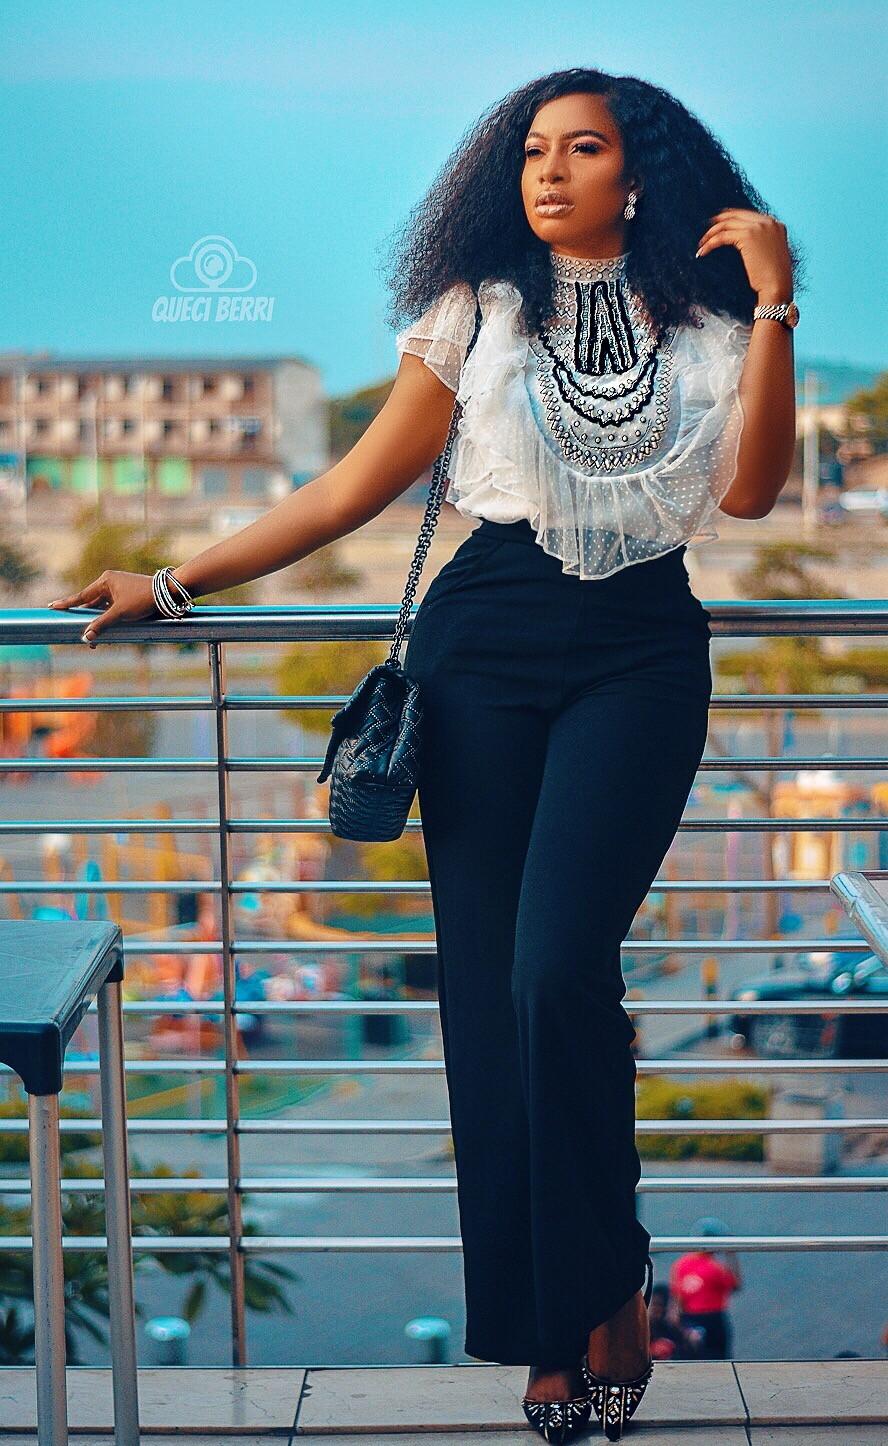 5c901ddabd93a - Chika Ike releases beautiful new photos